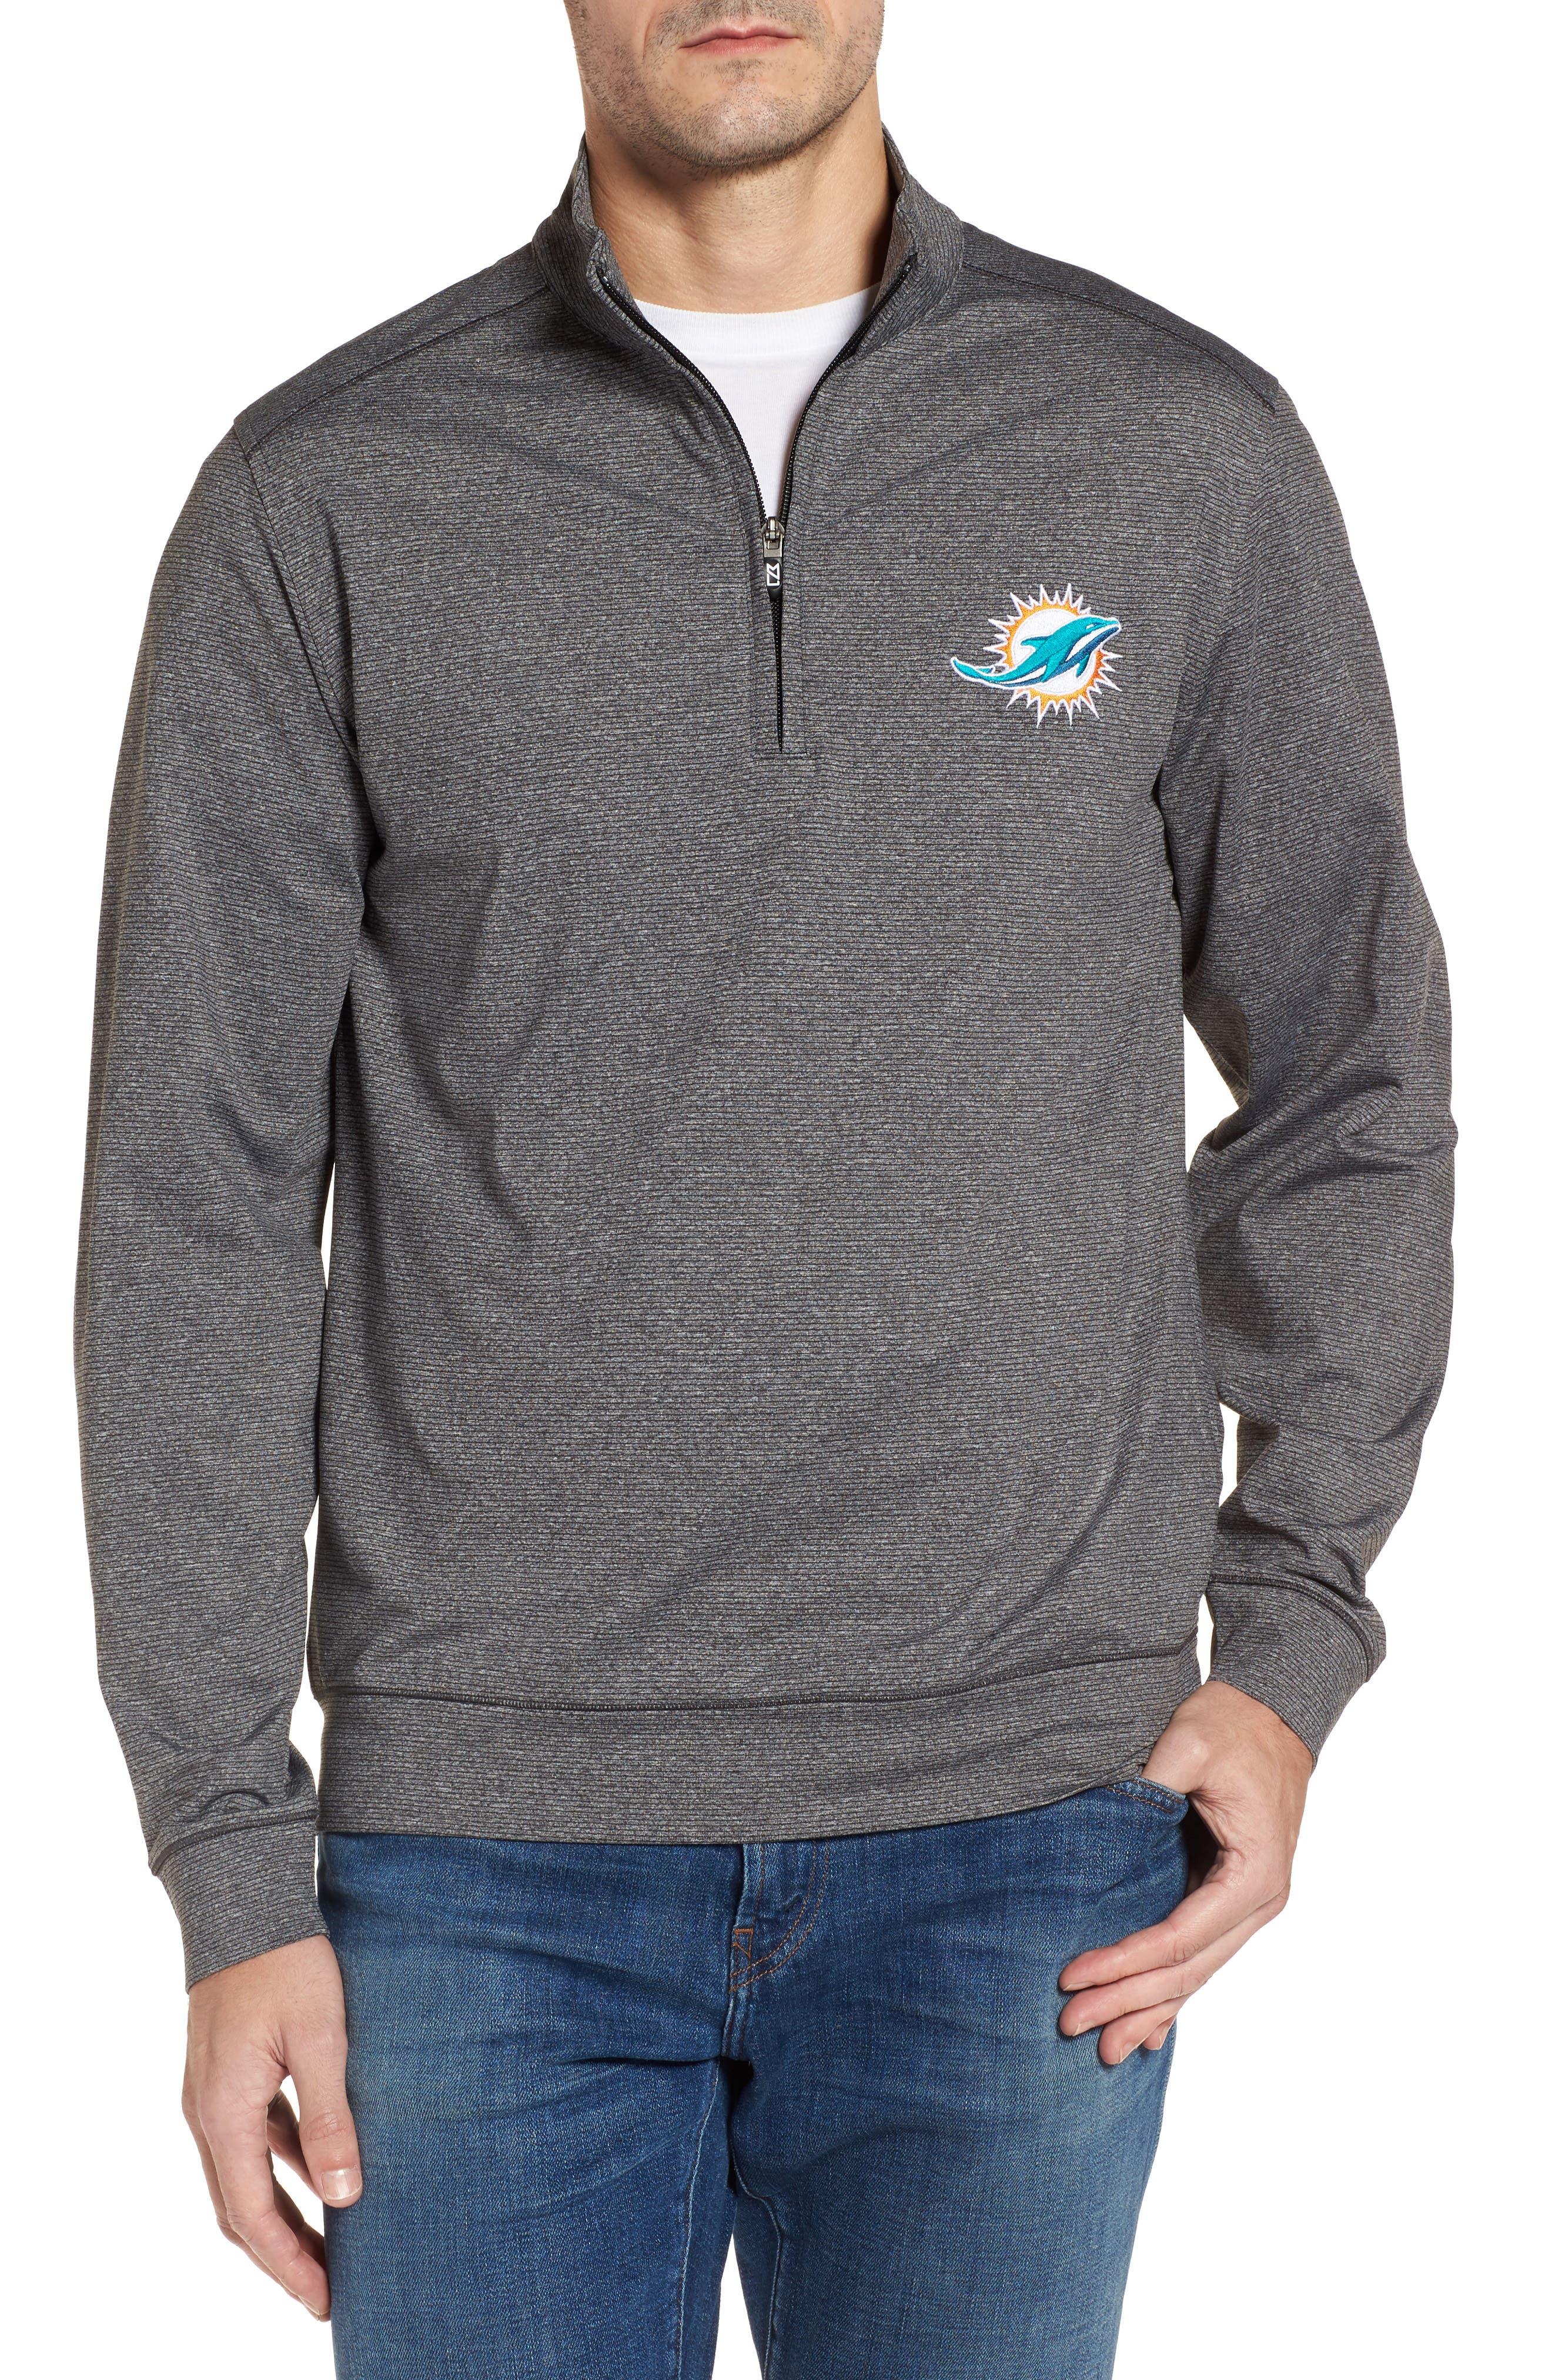 Shoreline - Miami Dolphins Half Zip Pullover,                             Main thumbnail 1, color,